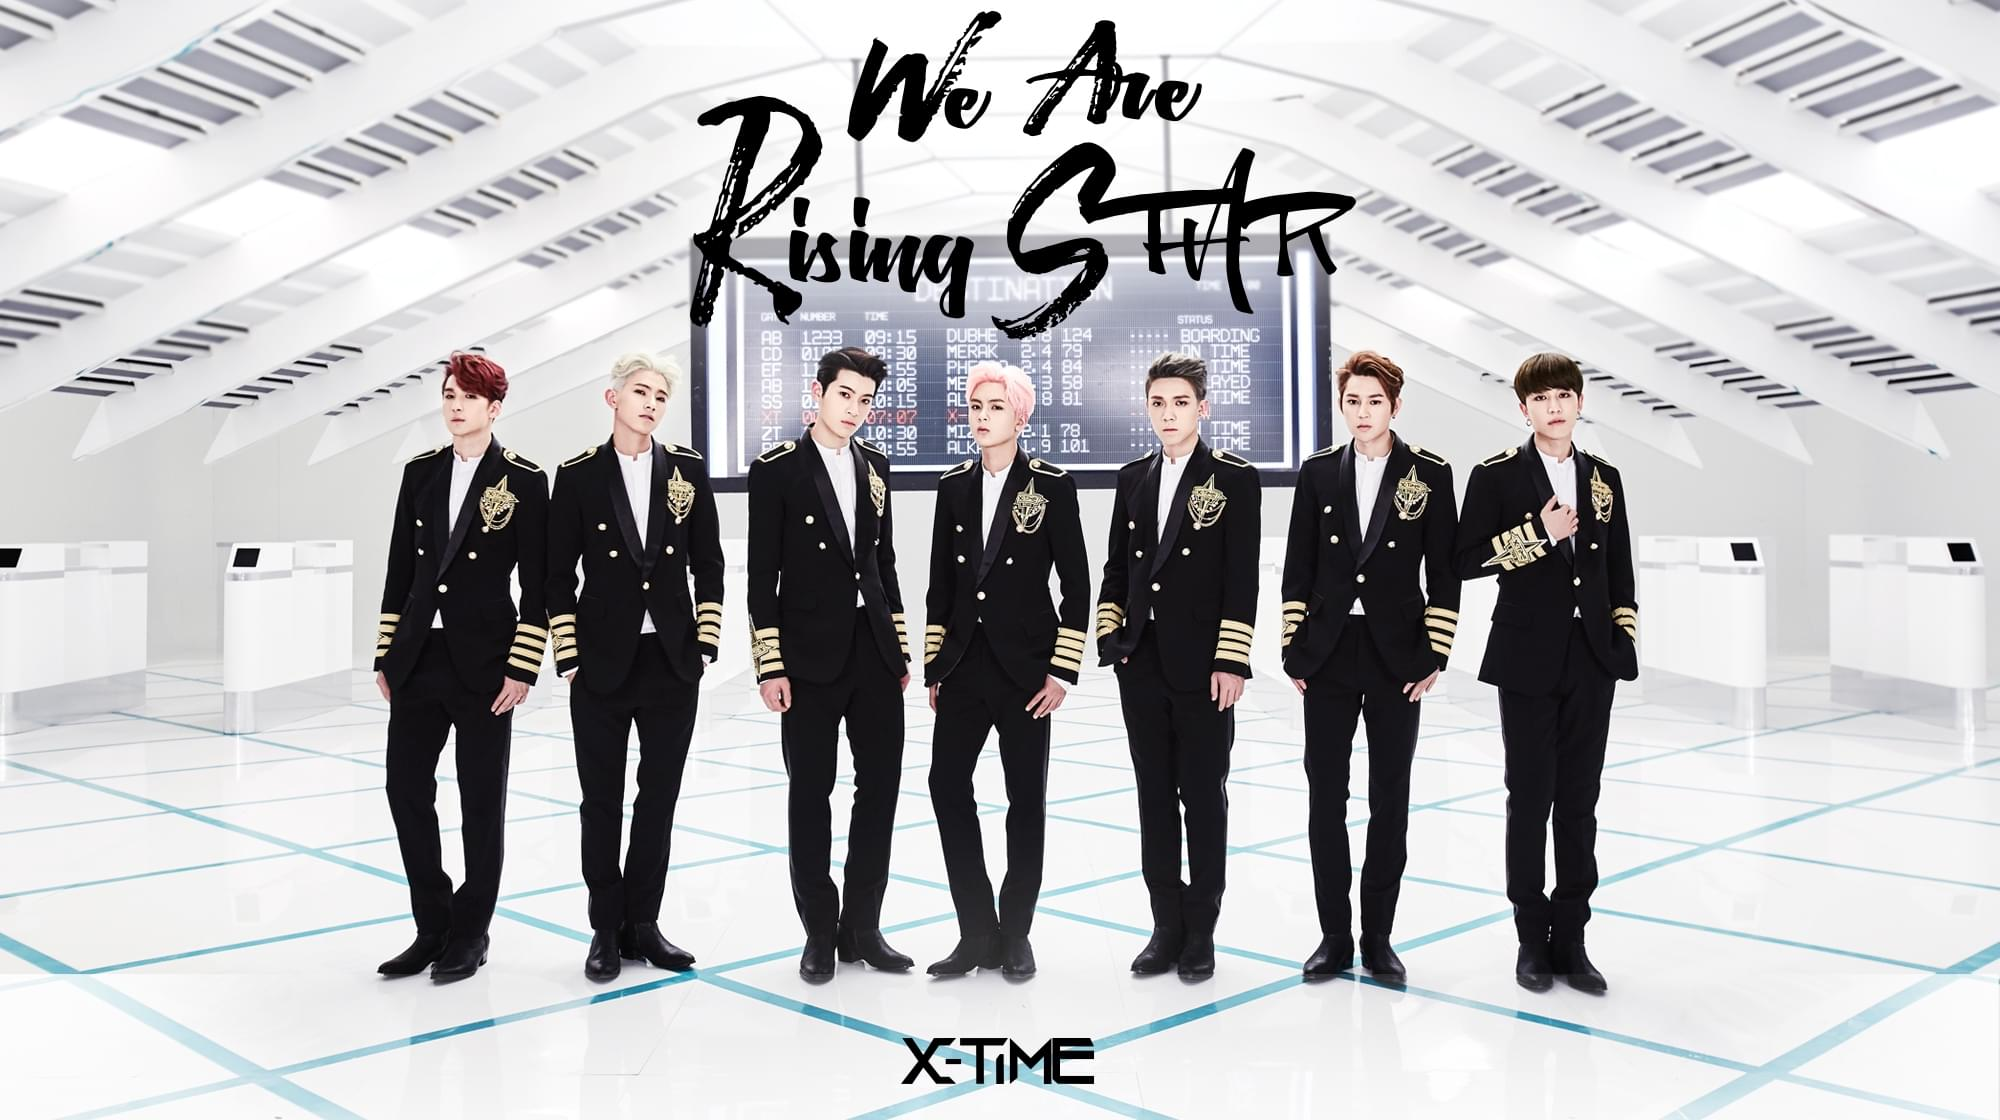 X-TIME首张EP重磅上线七子合体召唤新成员